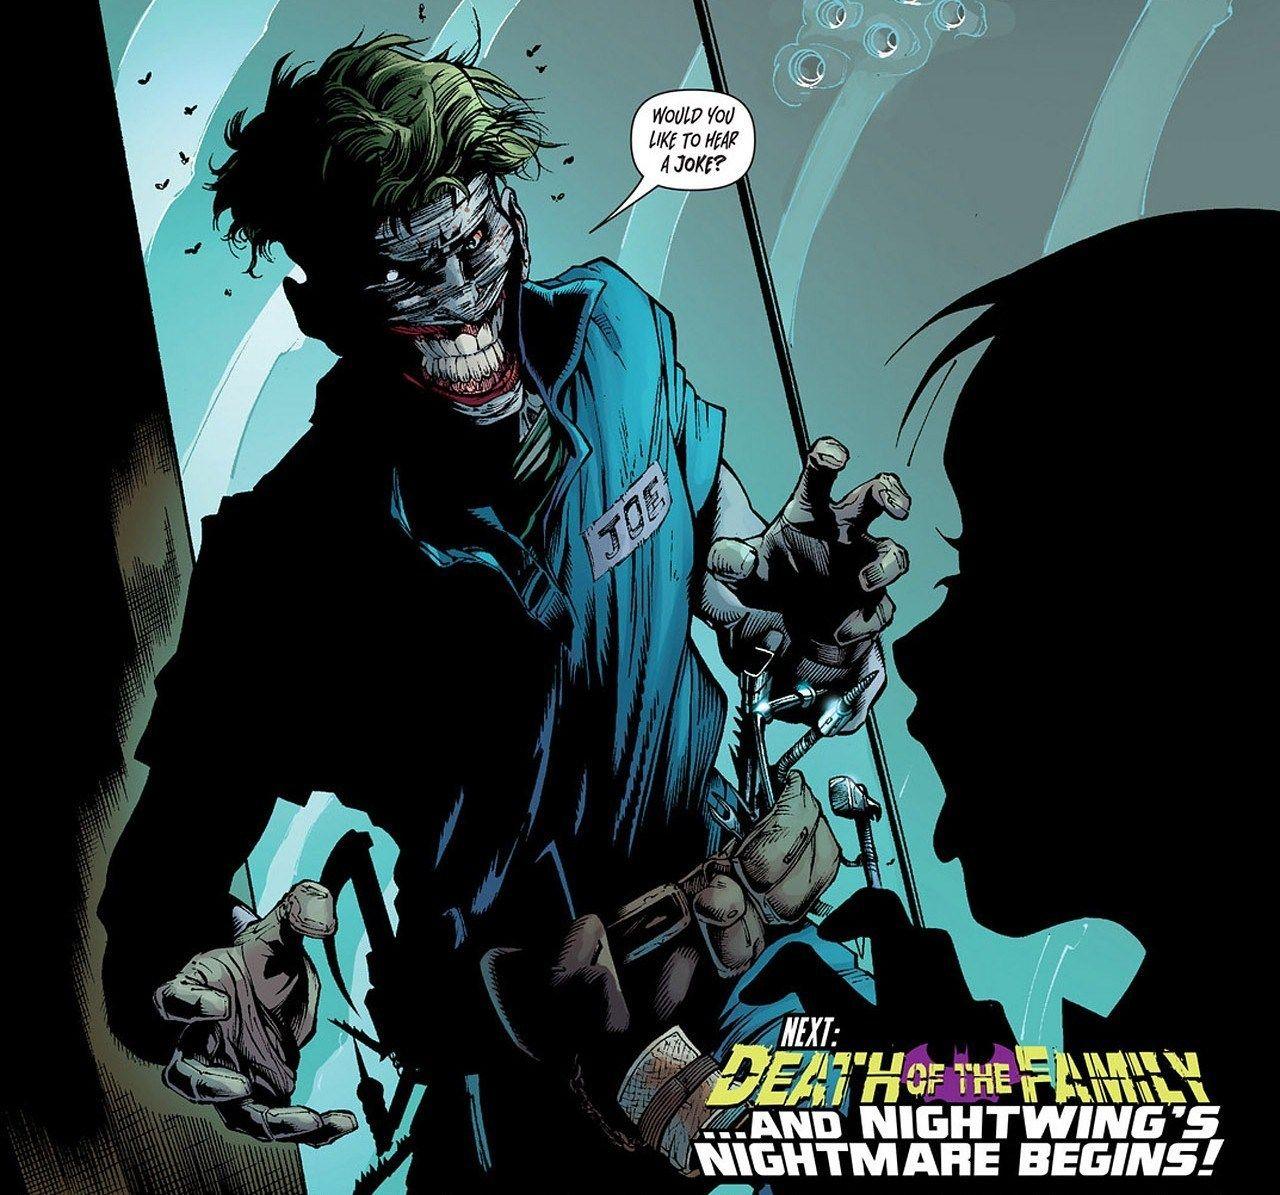 Pin By Cristian David Ramirez Contrer On The Three Jokers Joker Comic Batman Vs Joker Joker Death